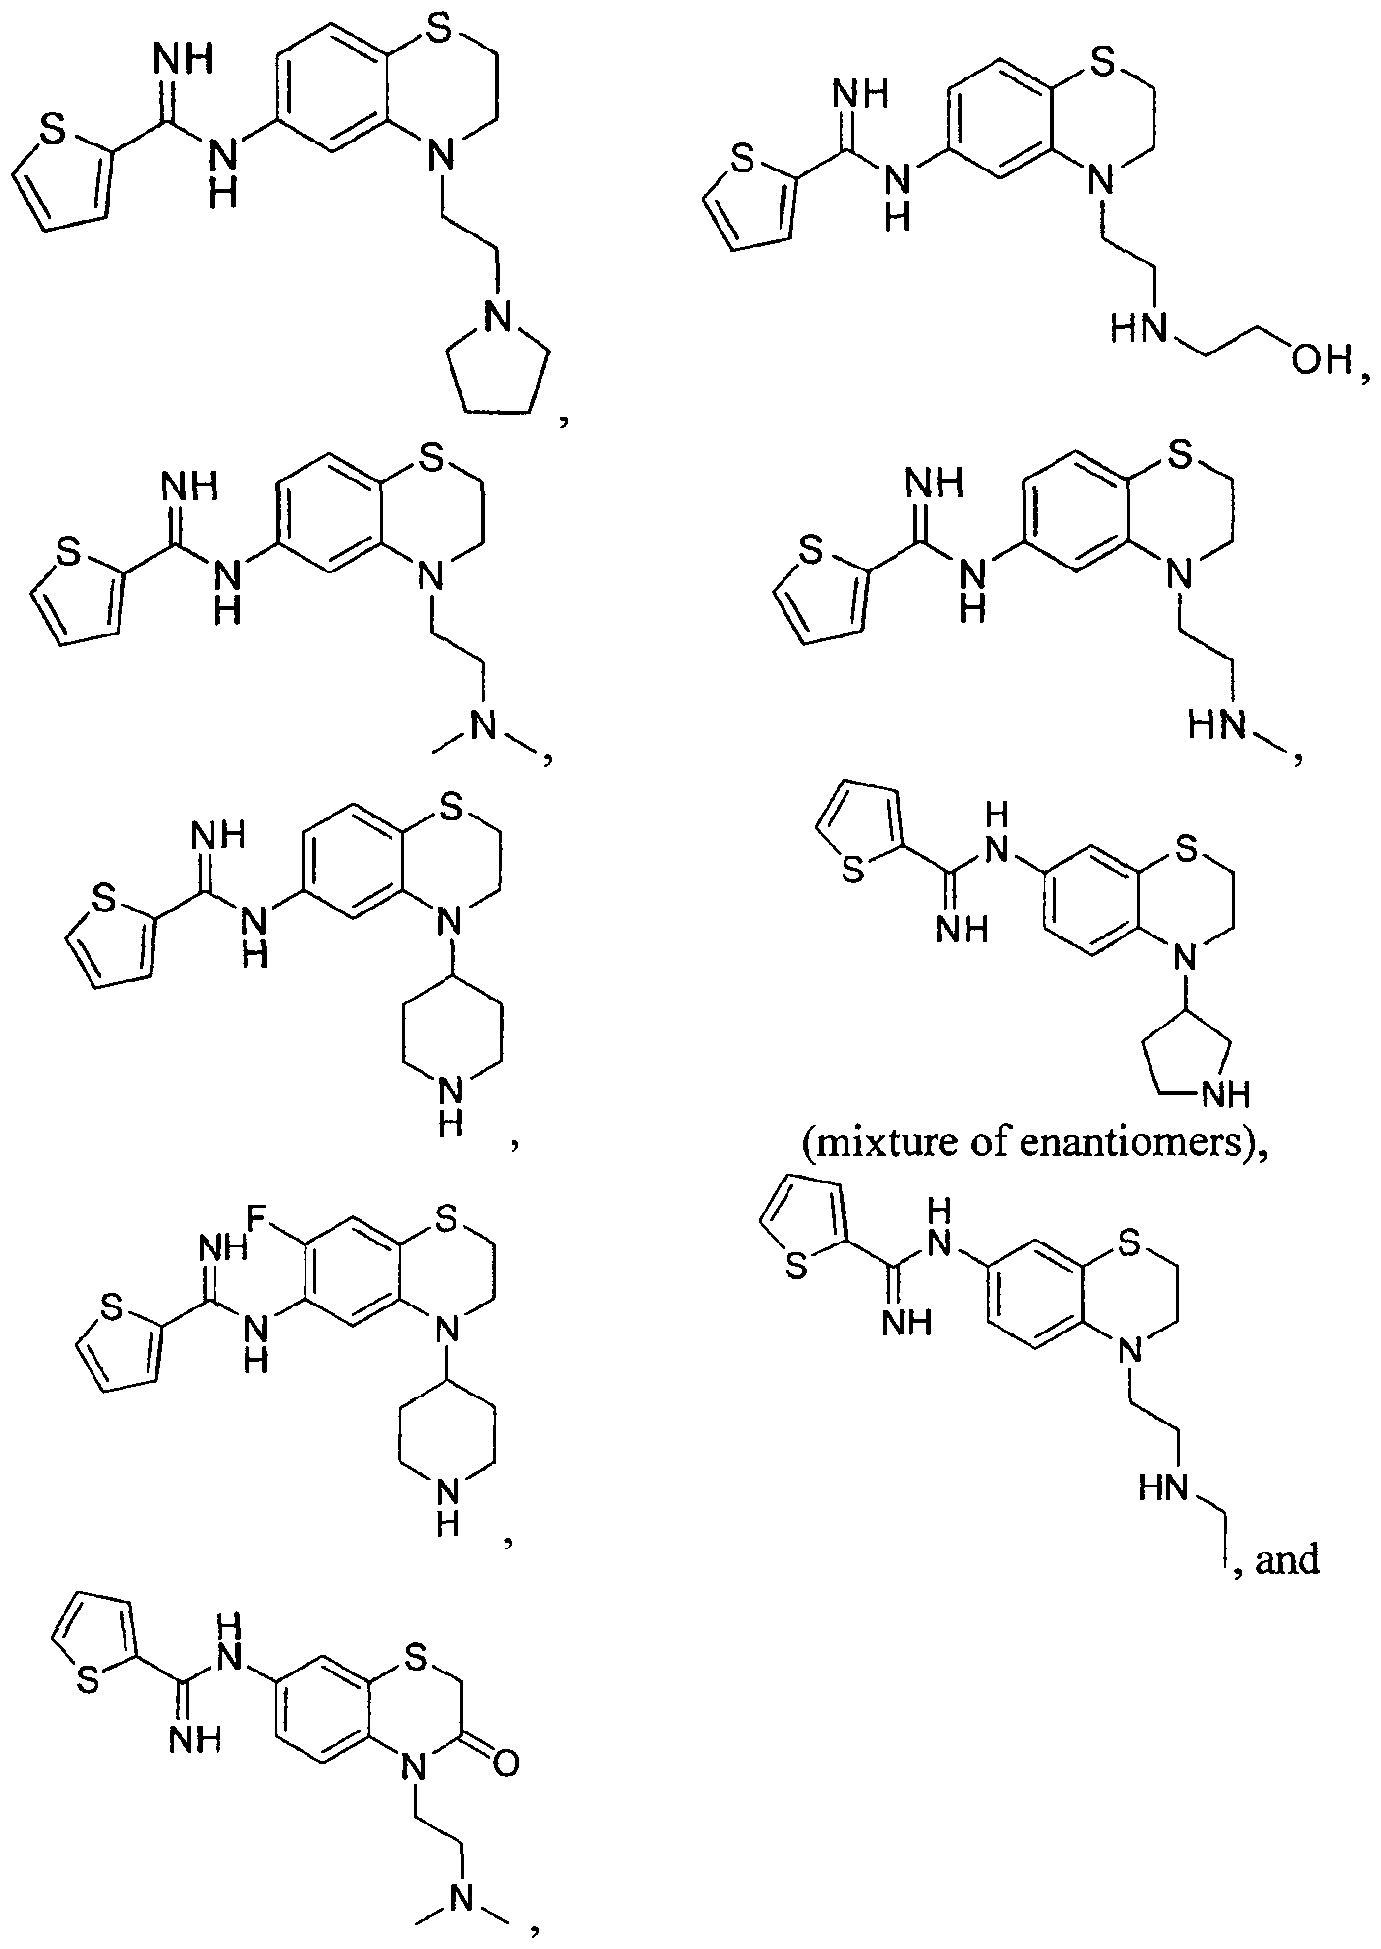 Patent ep2310386a1 benzoxazines benzothiazines and related figure imgf0000100001 nvjuhfo Choice Image